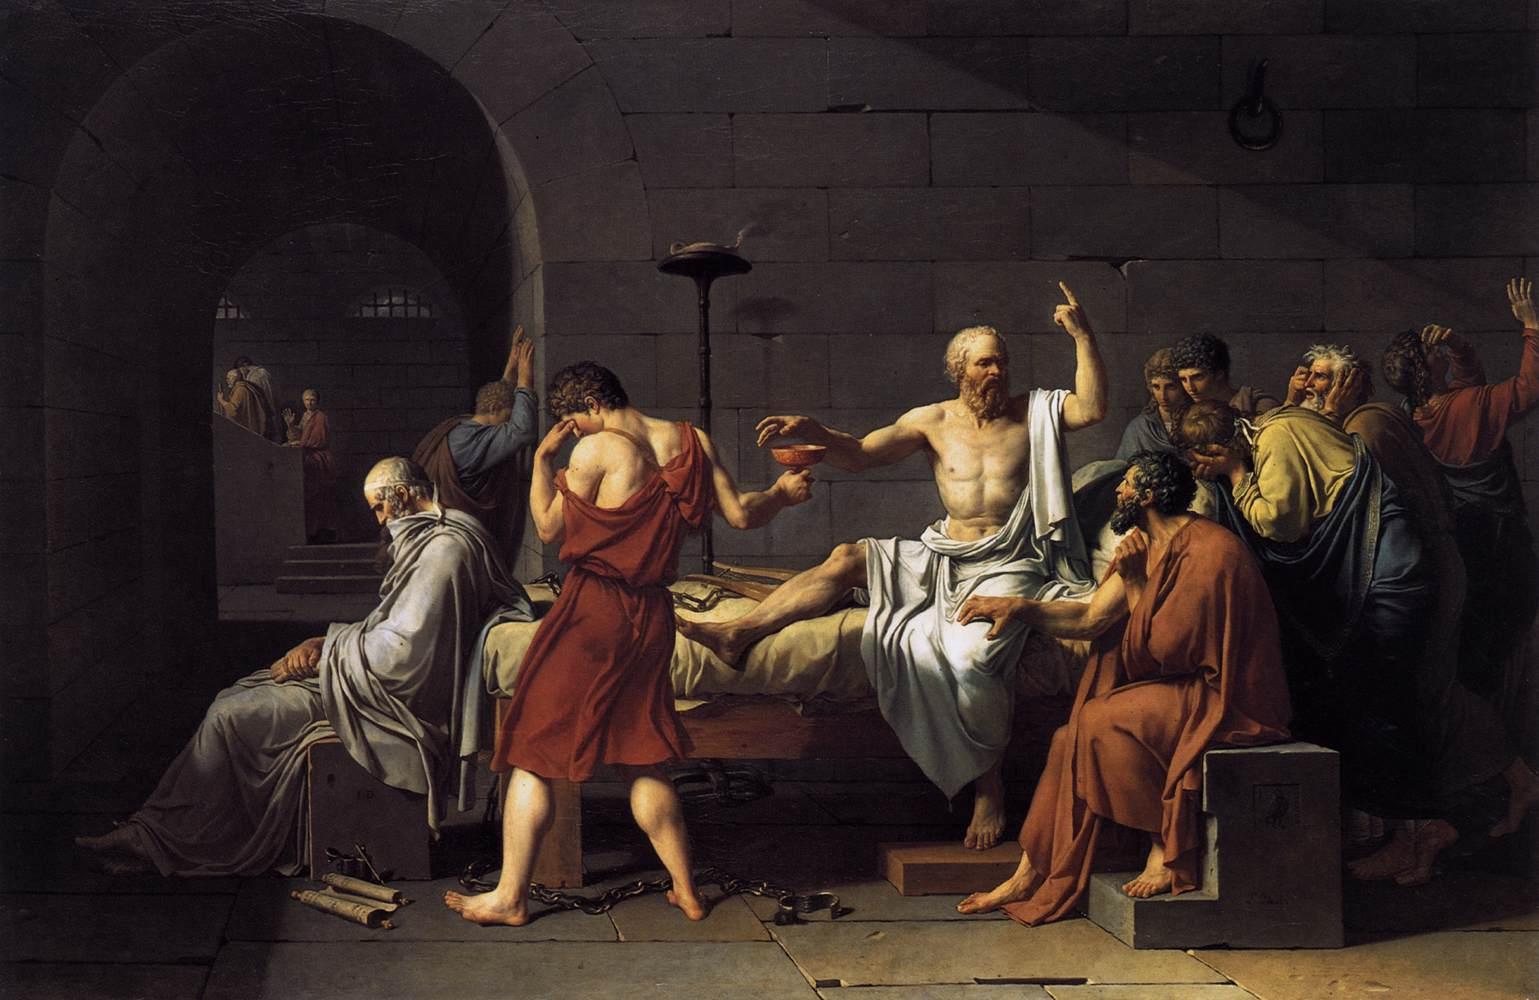 Socrates patriot unlike Europe EU